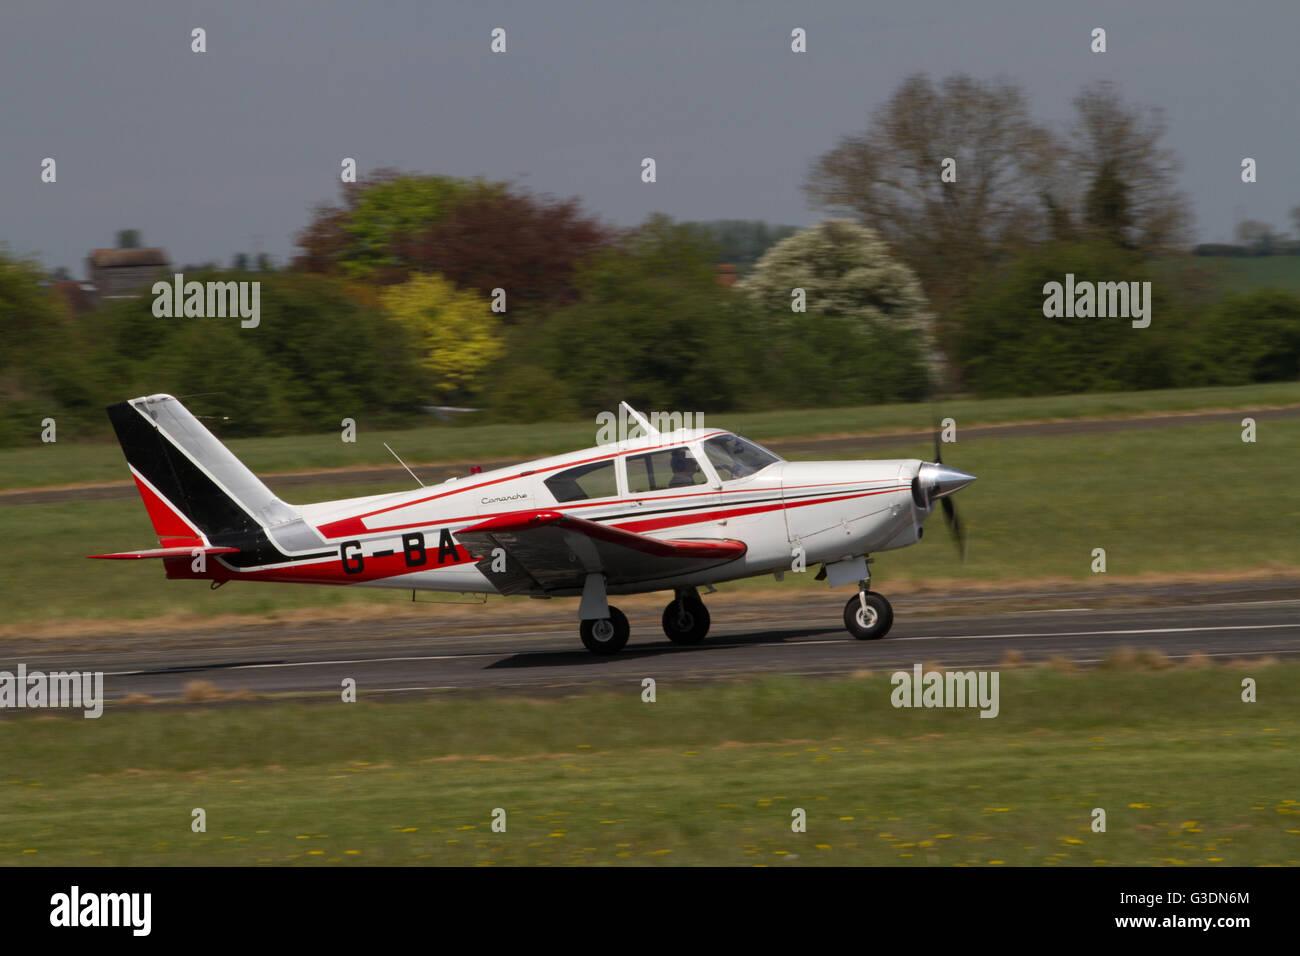 Single propeller aircraft taxiing alon runway after landing at Wolverhampton Halfpenny Green Airport. UK - Stock Image